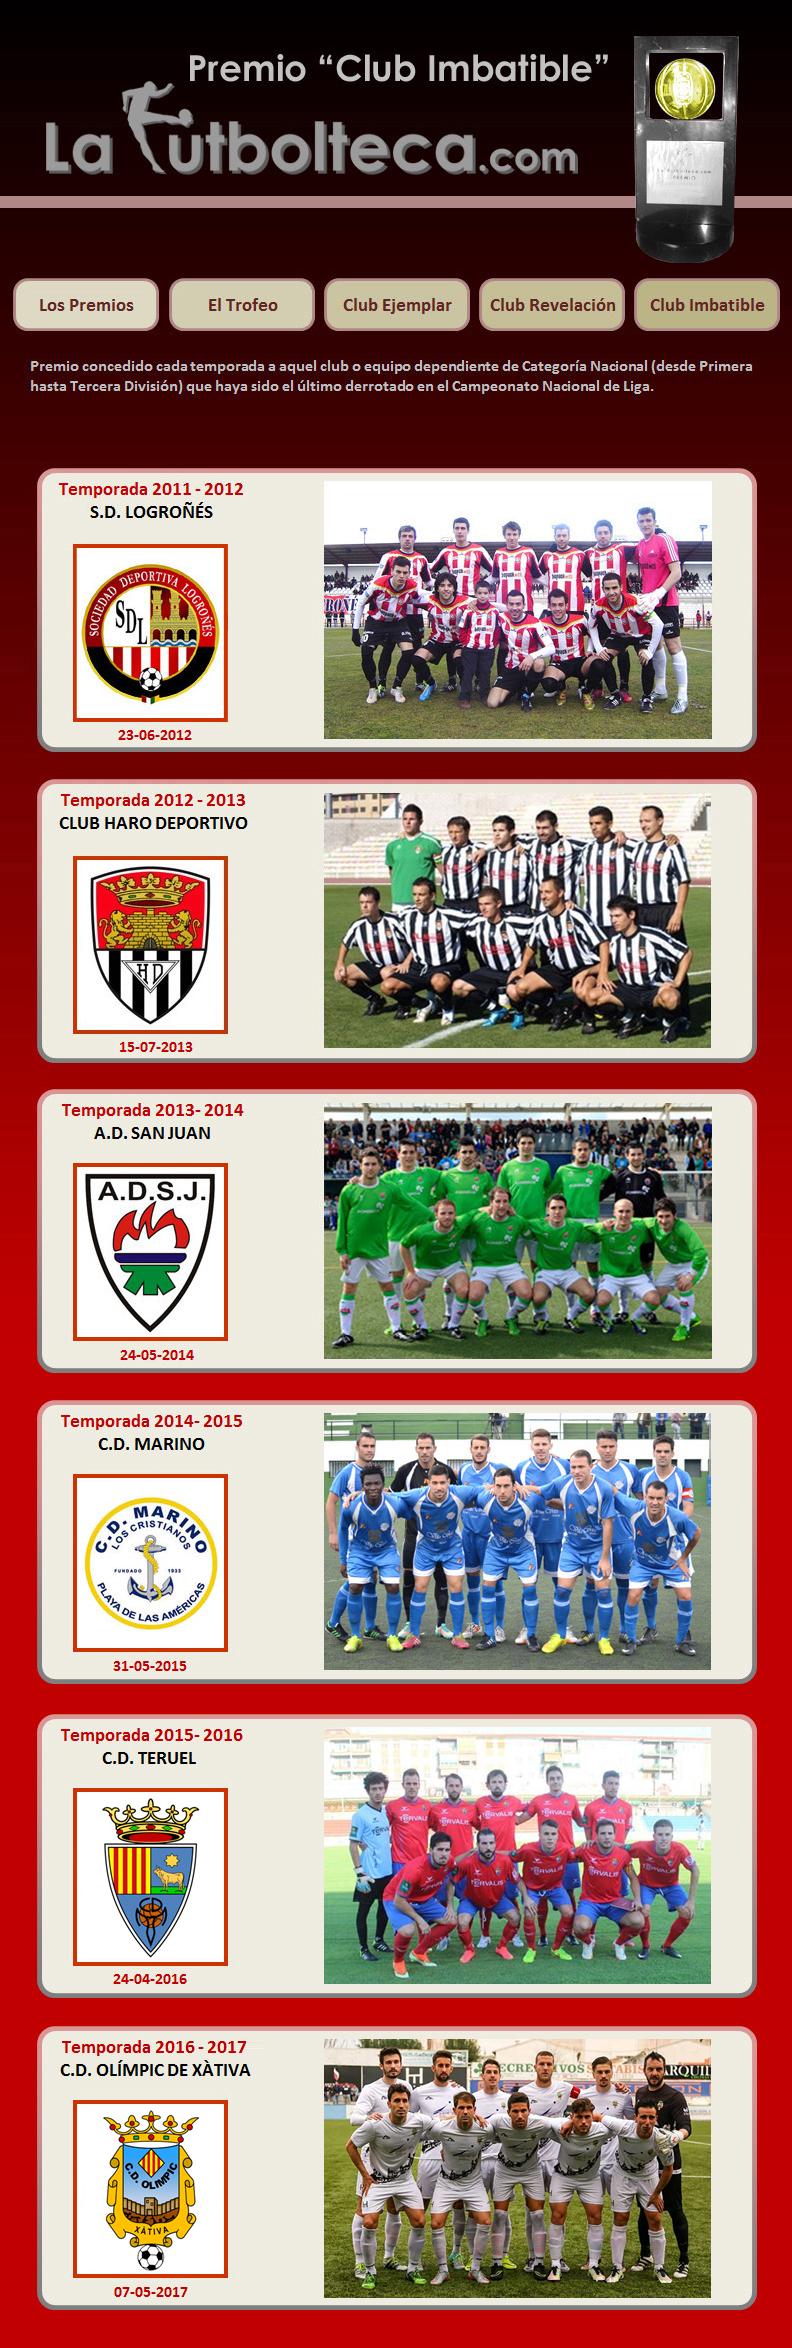 Premios La Futbolteca Club Imbatible